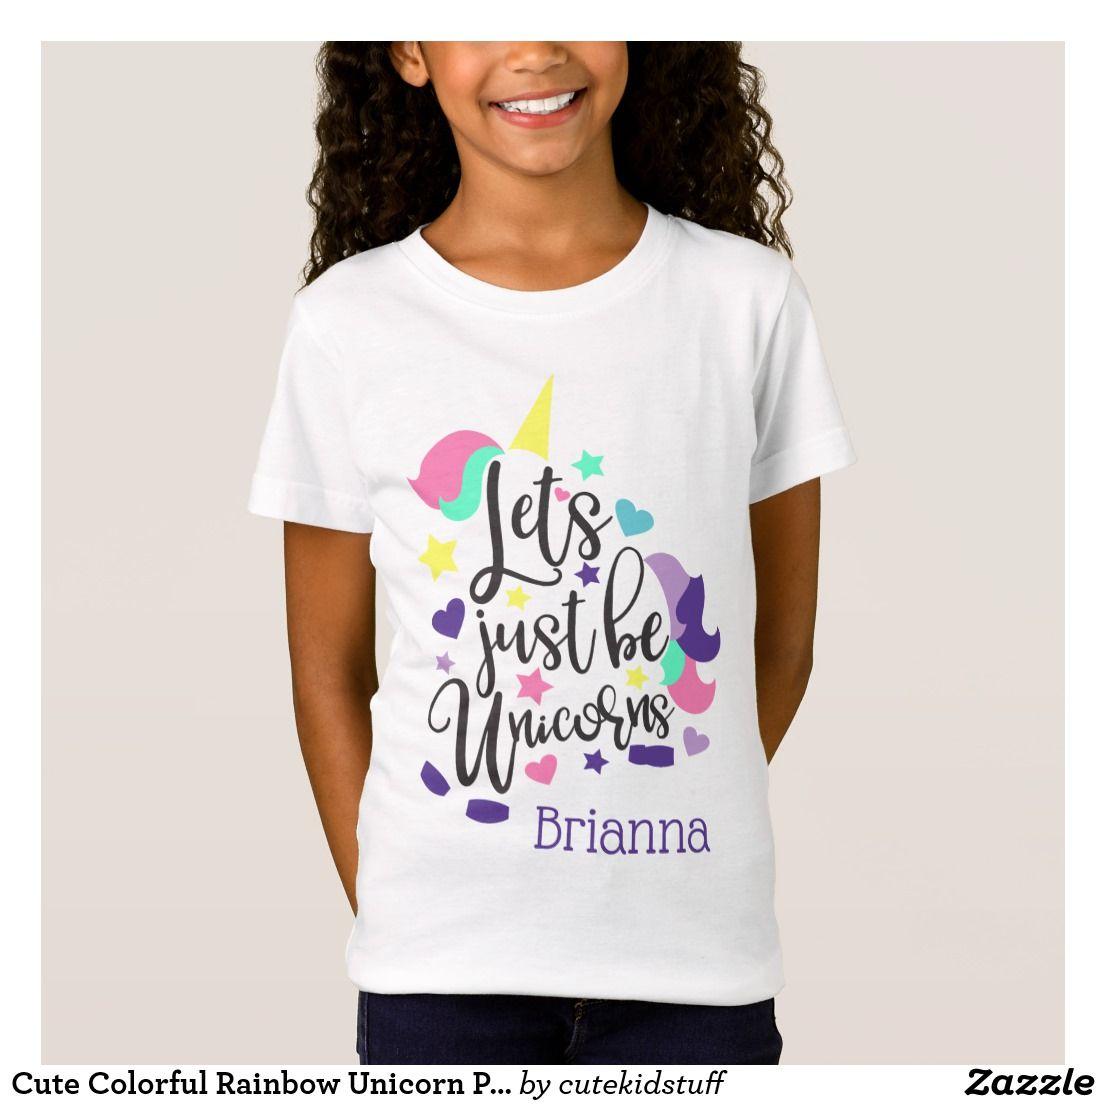 Cute Colorful Rainbow Unicorn Personalized T Shirt Birthday Girl T Shirt Personalized T Shirts Cool T Shirts,2018 Grand Design Solitude 375res